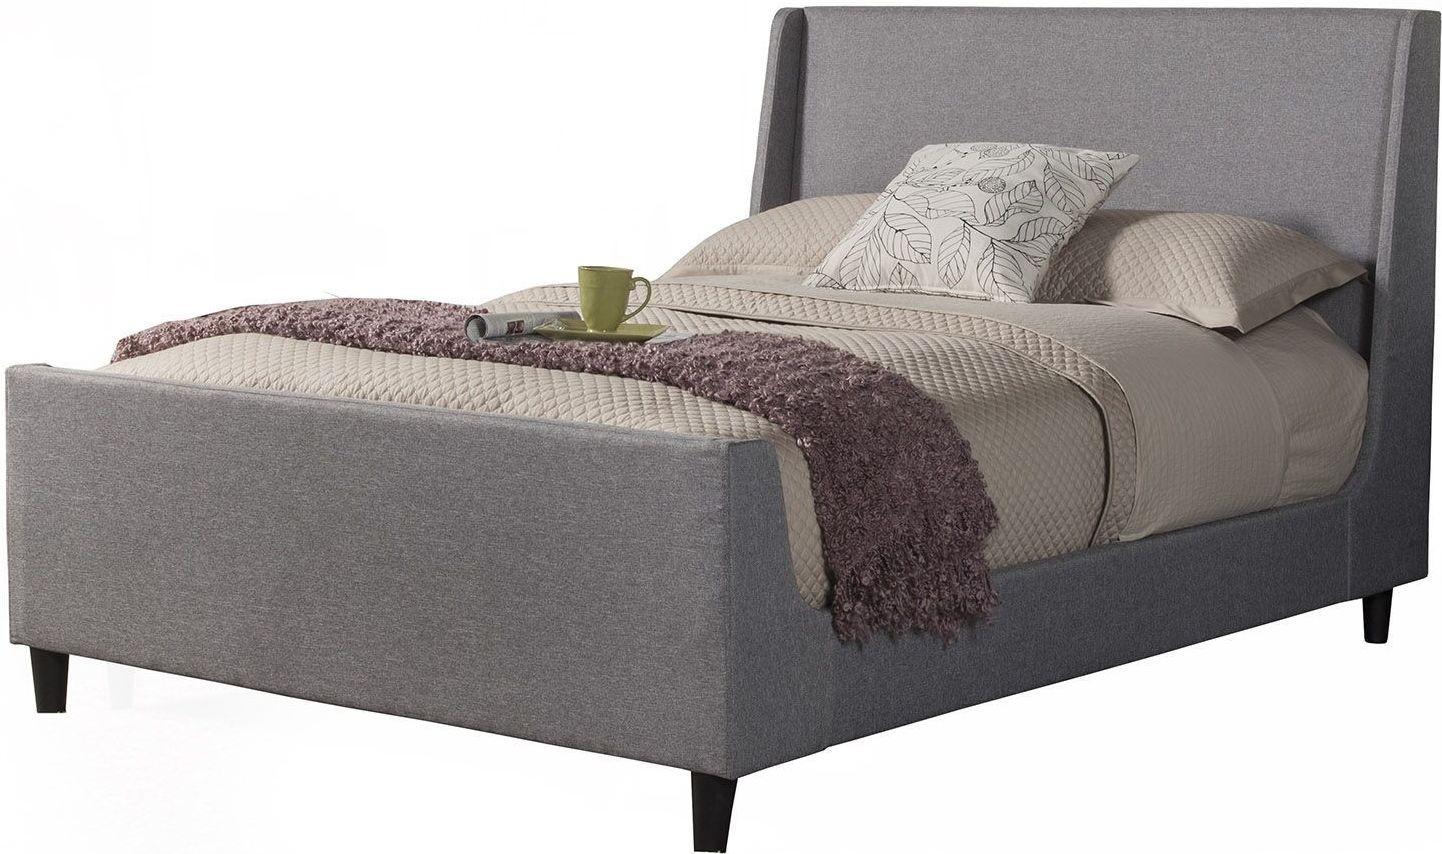 Amber Linen Upholstered Cal King Platform Bed From Alpine